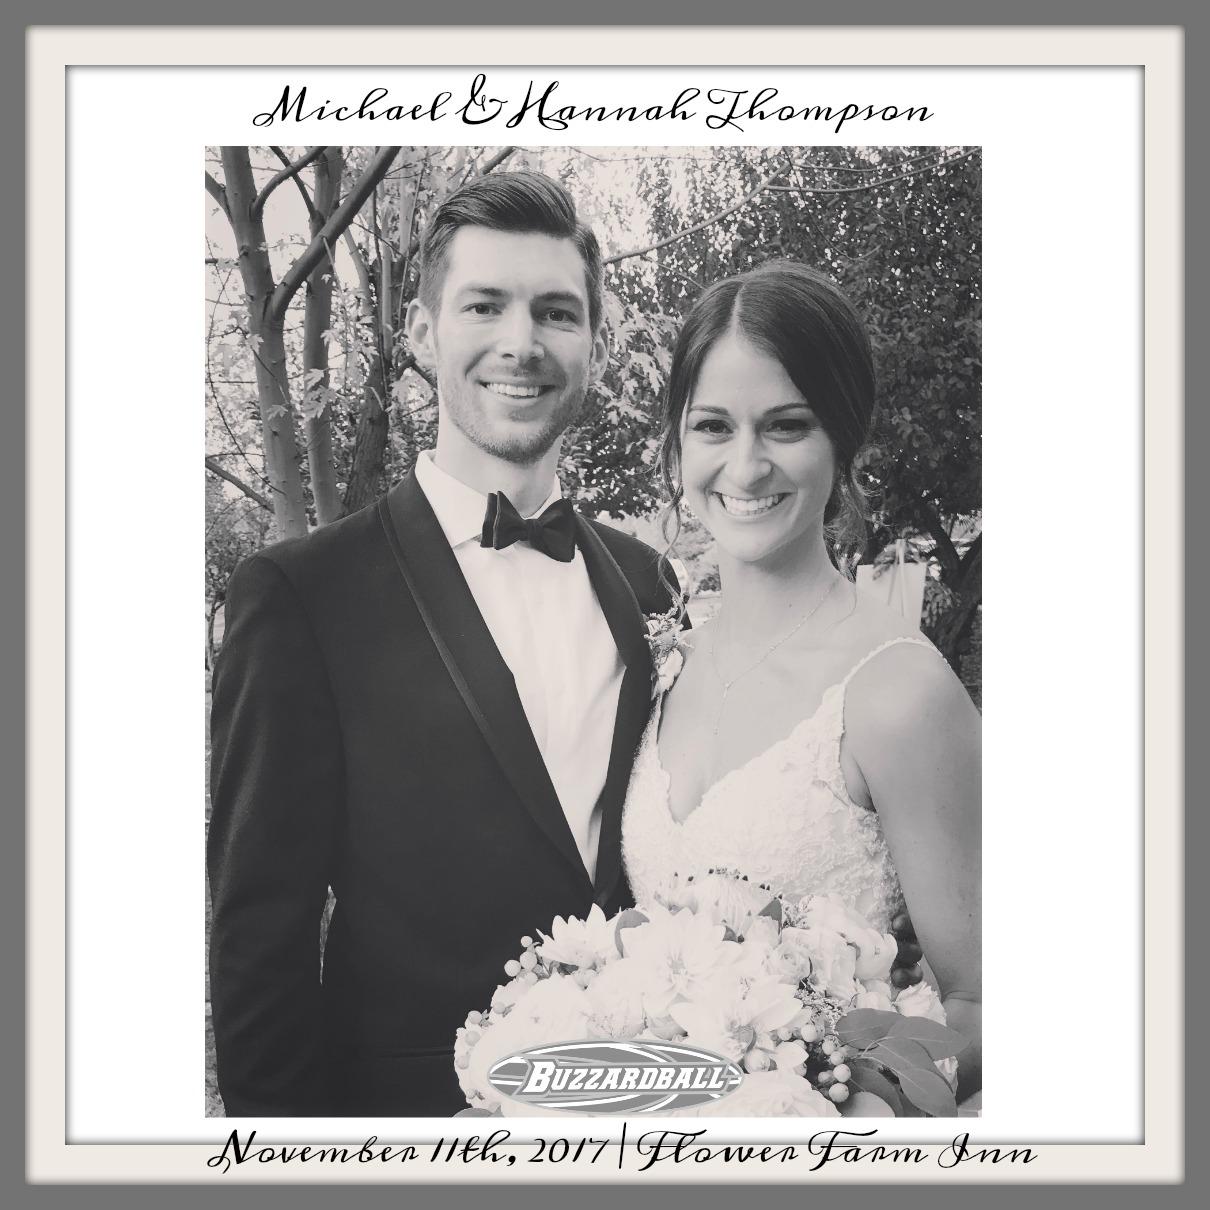 2017 11 11 Michael and Hannah Thompson.jpg